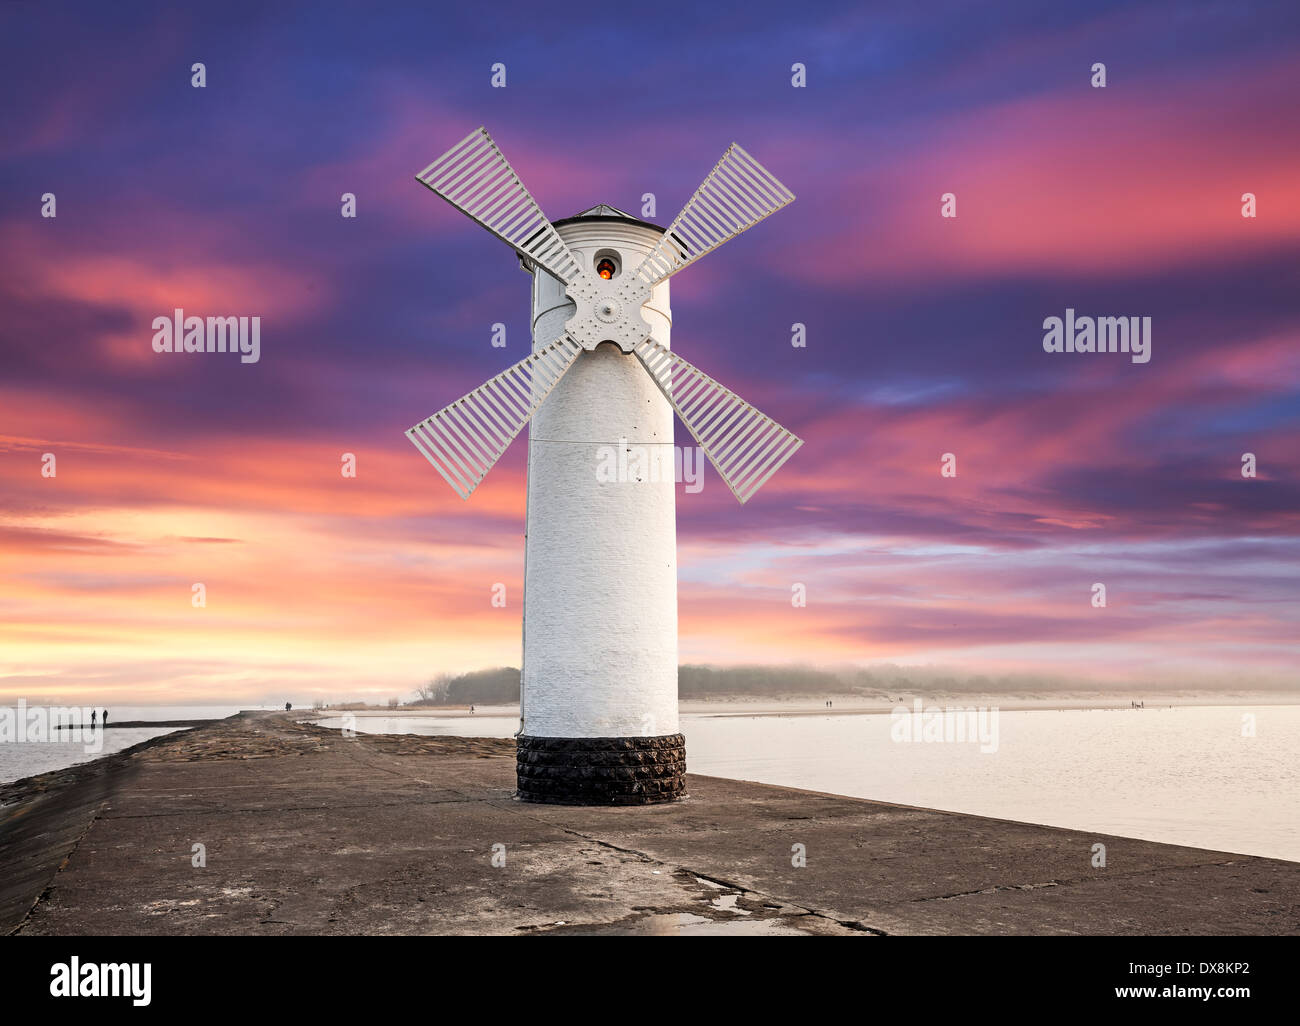 Lighthouse windmill with dramatic sunset sky, Swinoujscie, Baltic Sea, Poland. Stock Photo